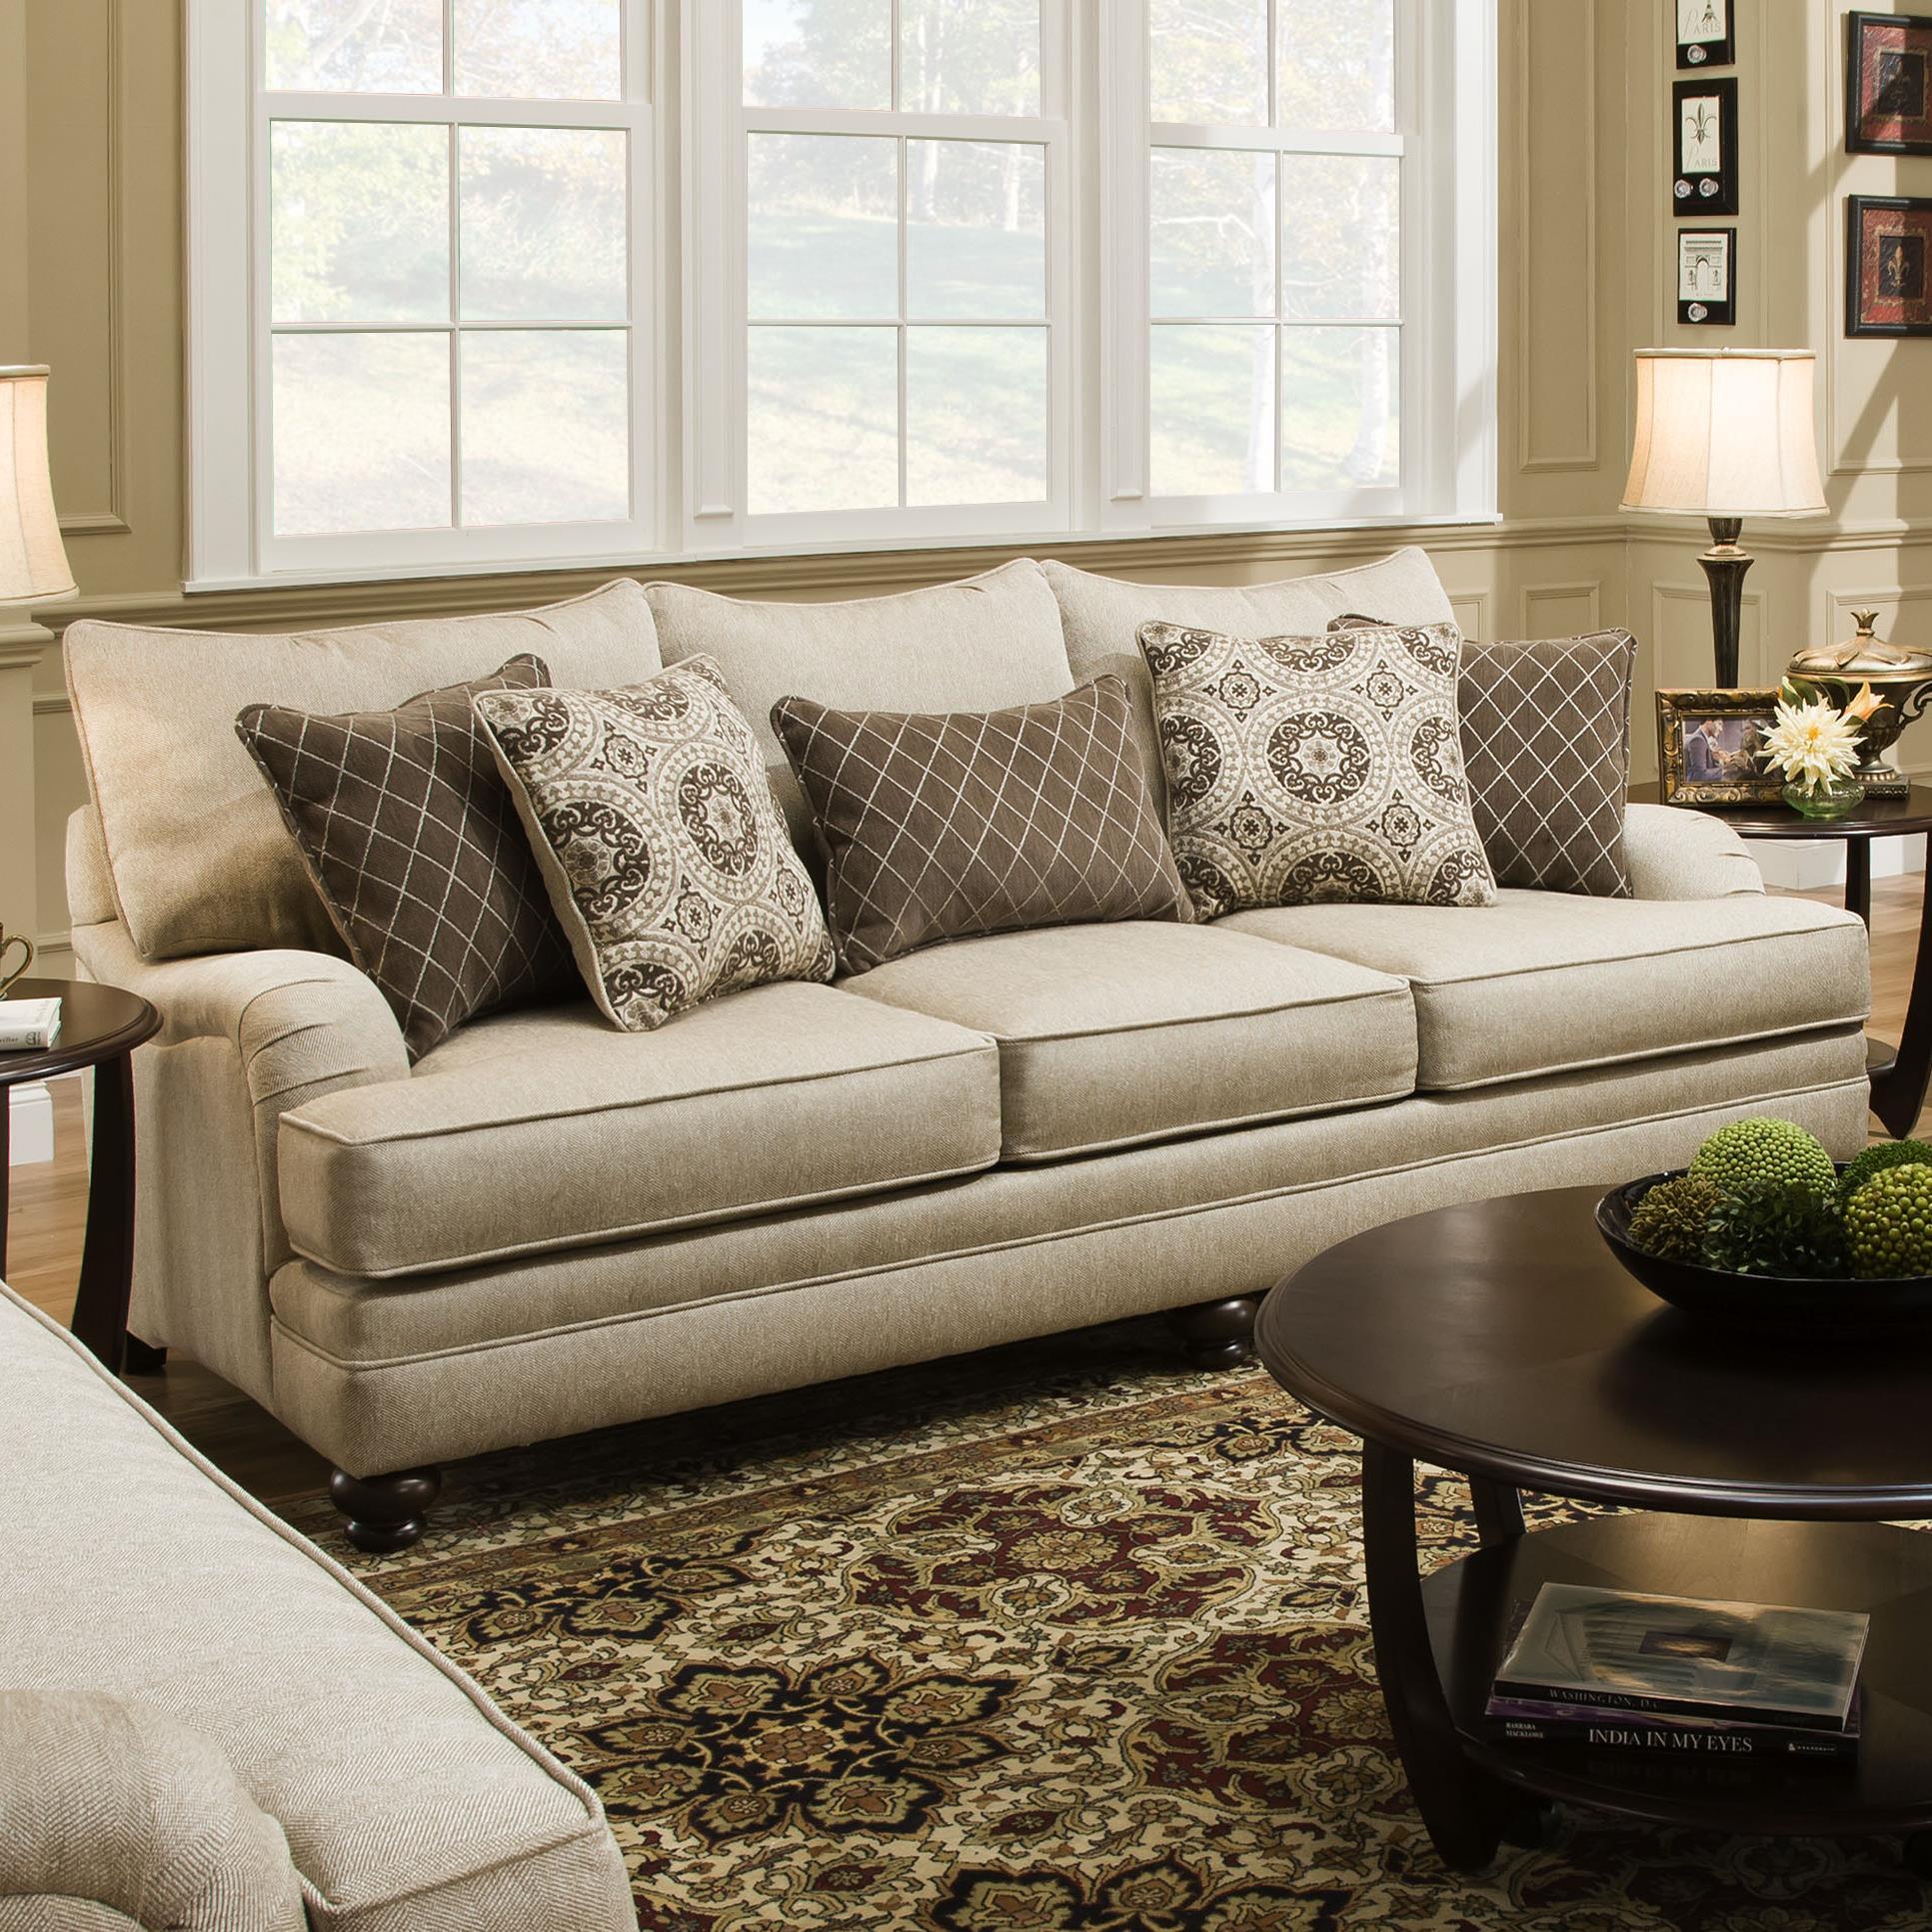 corinthian leather sofa de canto com chaise retratil american aldo manual reclining mocha